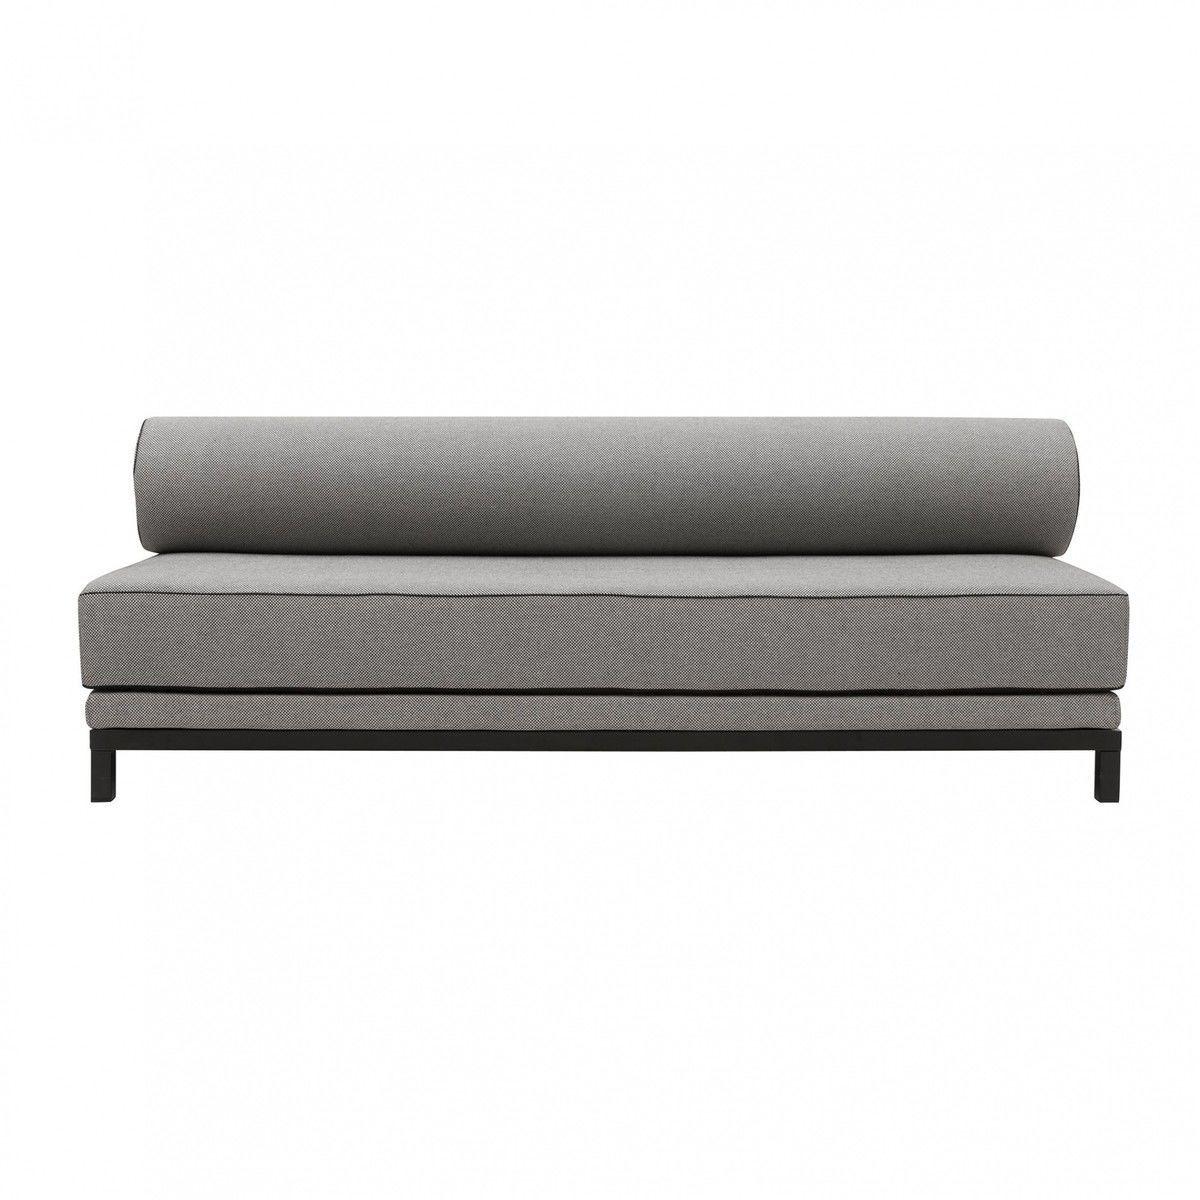 Sleep Day Bed Sofa Bed Softline Ambientedirect Com